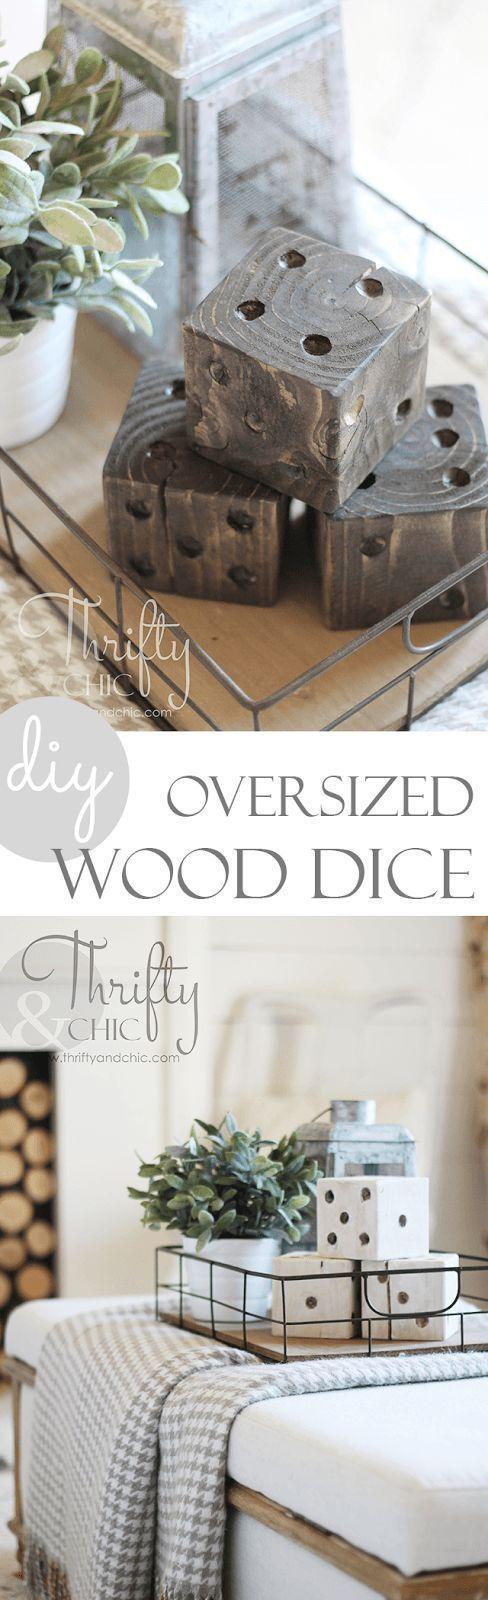 DIY oversized wood dice | 15 Easy DIY Reclaimed Wood Projects #WoodworkingProjectsGarden